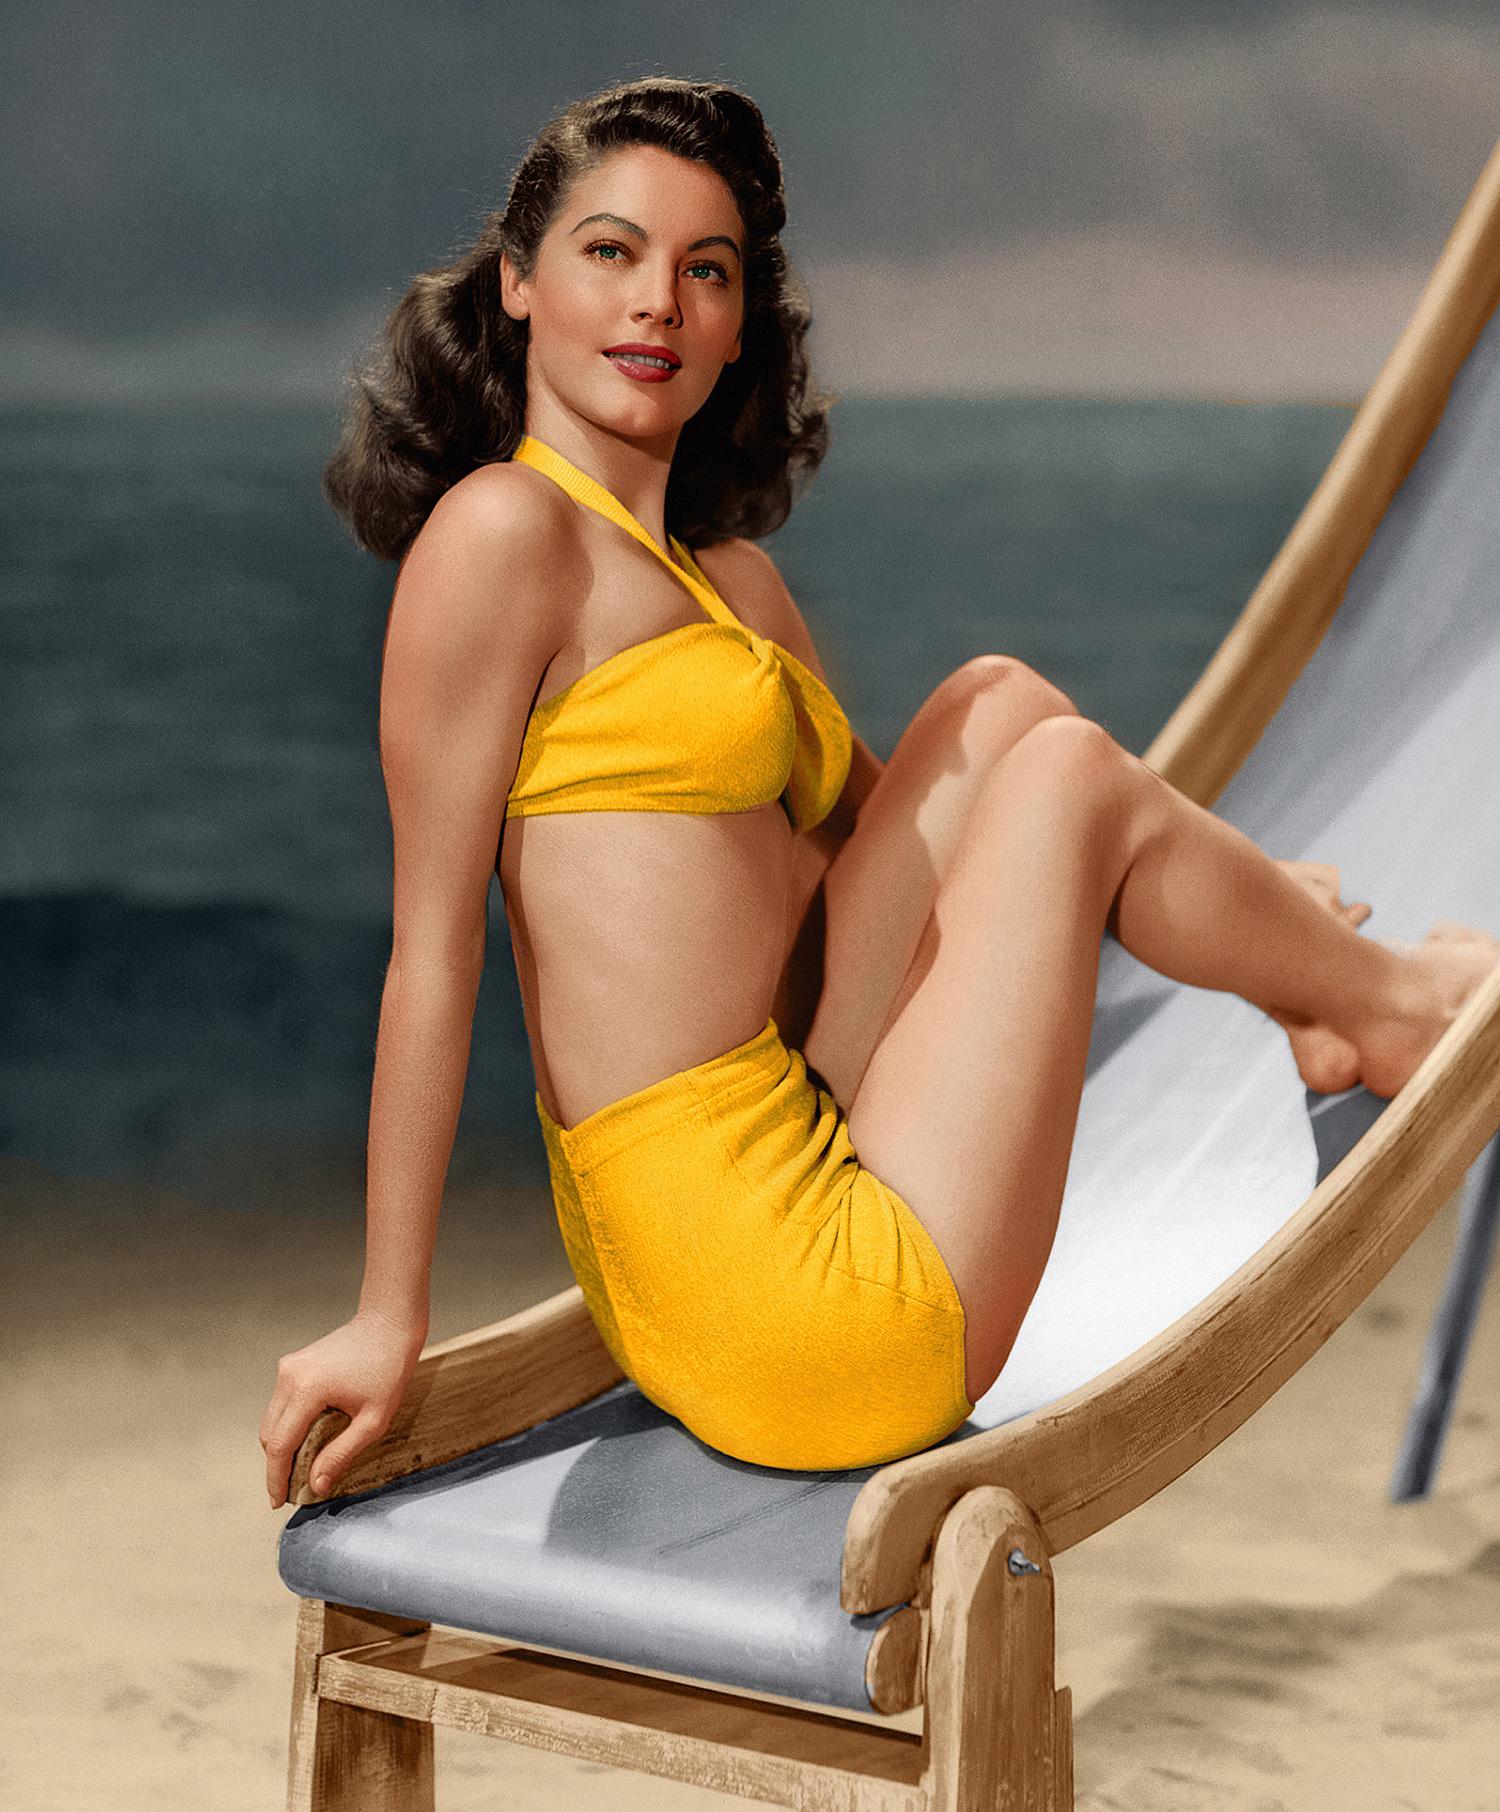 Ava Gardner wearing yellow swimsuit